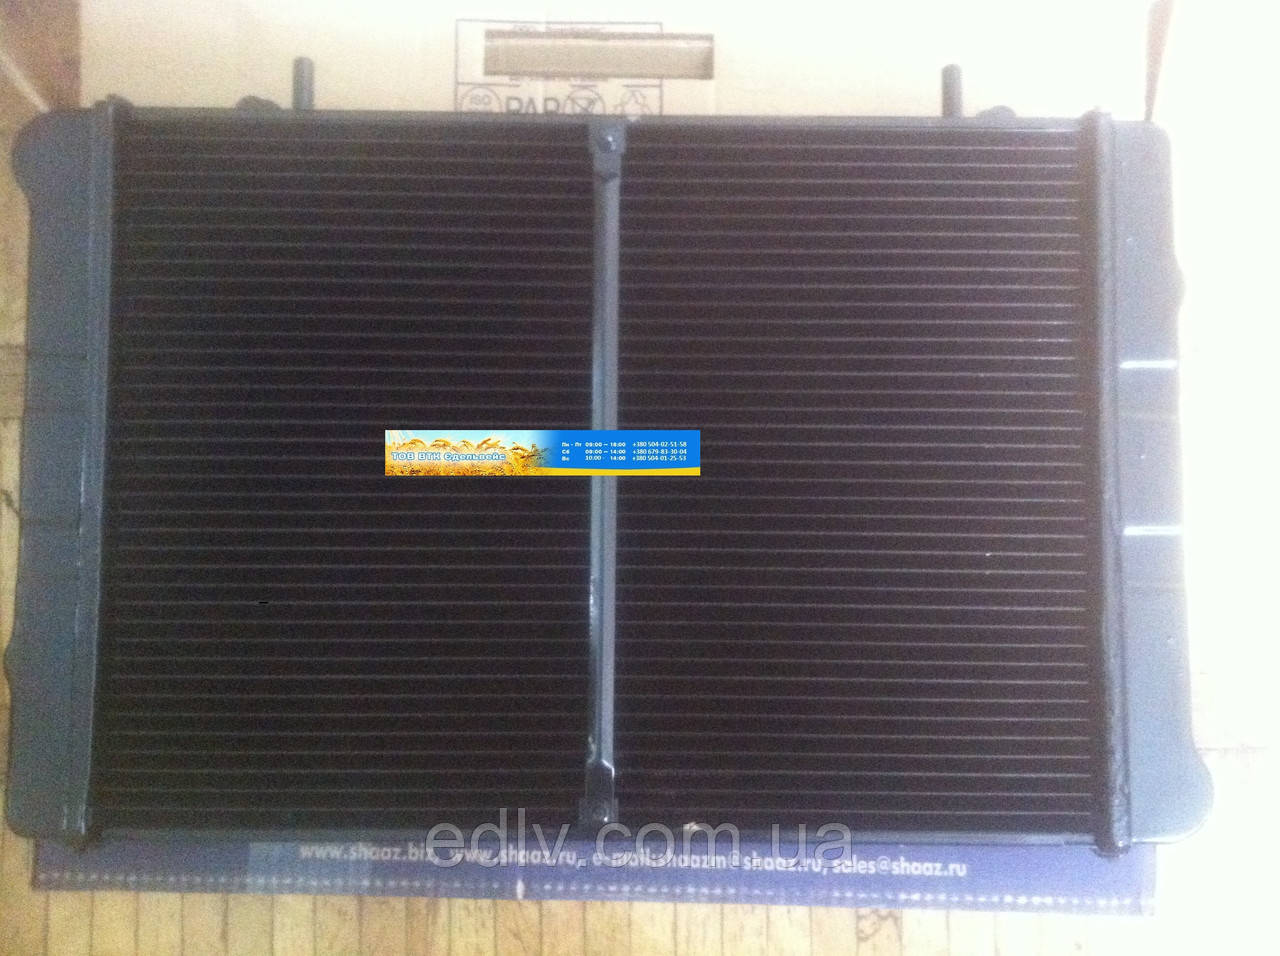 Радиатор вод. охлажд. ГАЗЕЛЬ-БИЗНЕС (2-х рядн.) двиг.4216 (пр-во ШААЗ) 33027-1301010